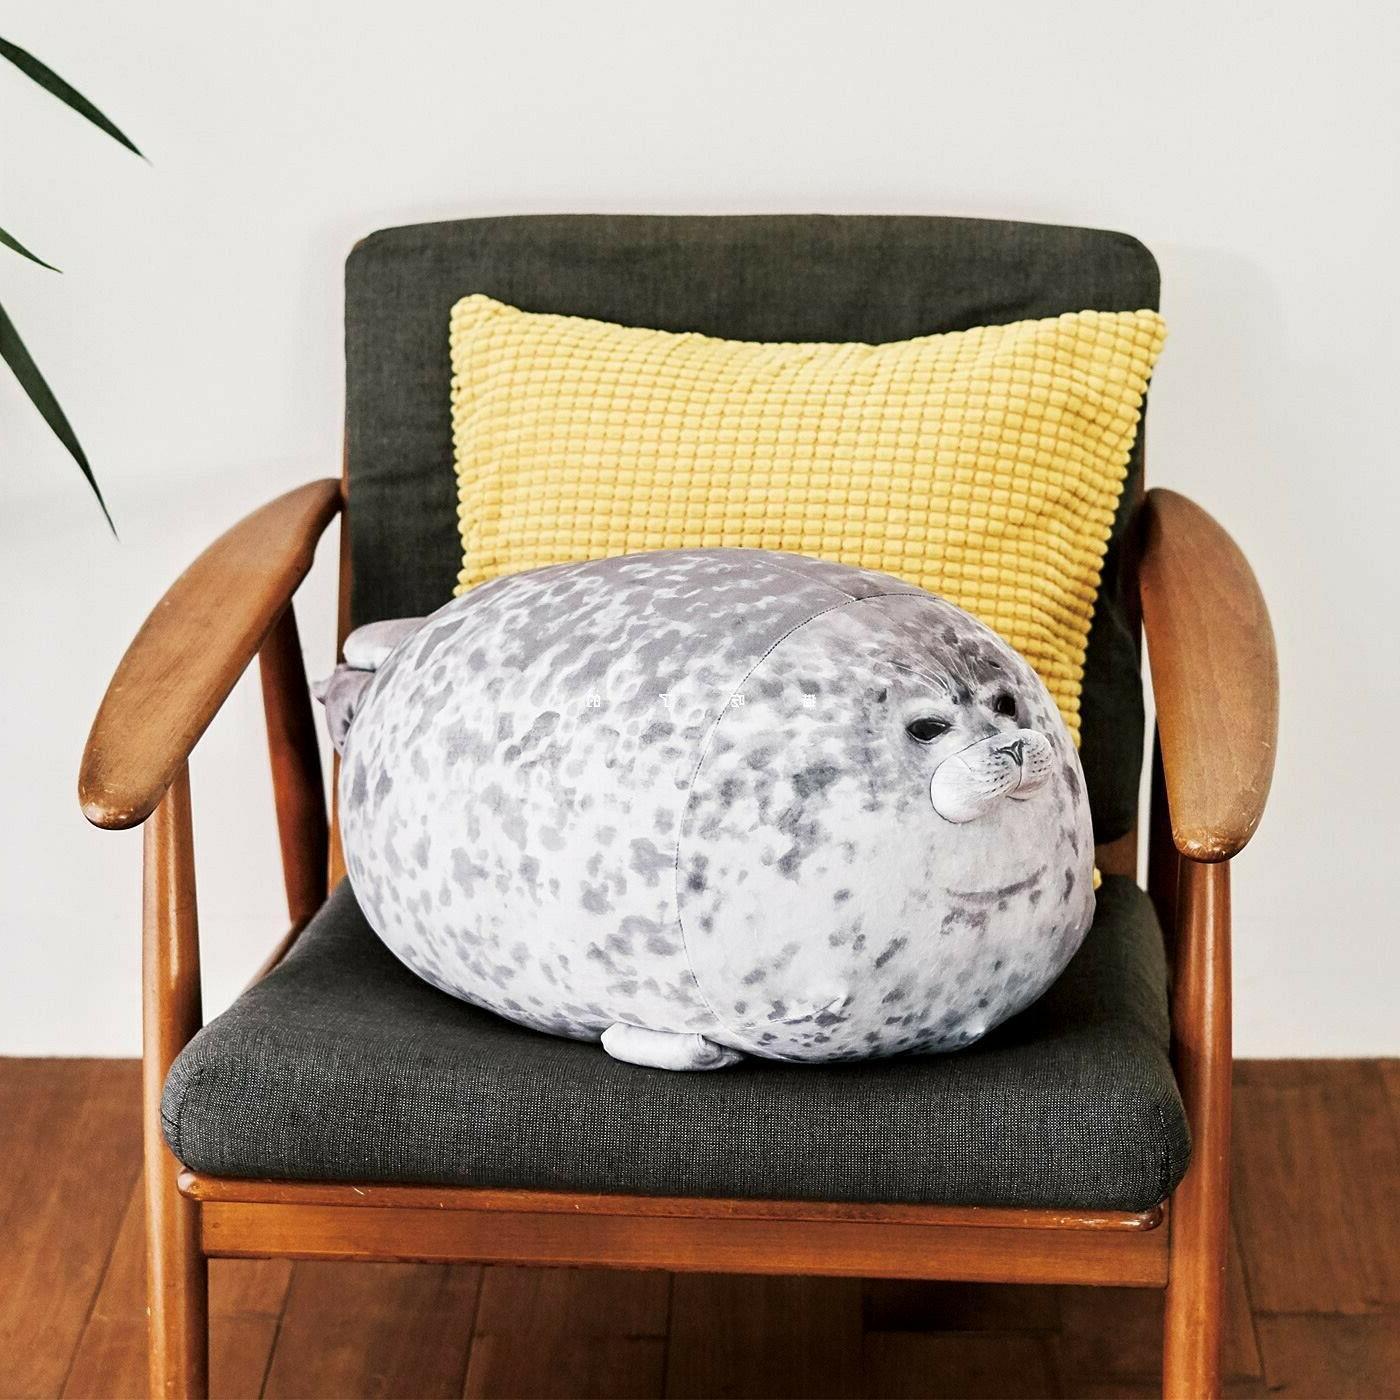 30cm Chubby Blob Plush Animal Doll